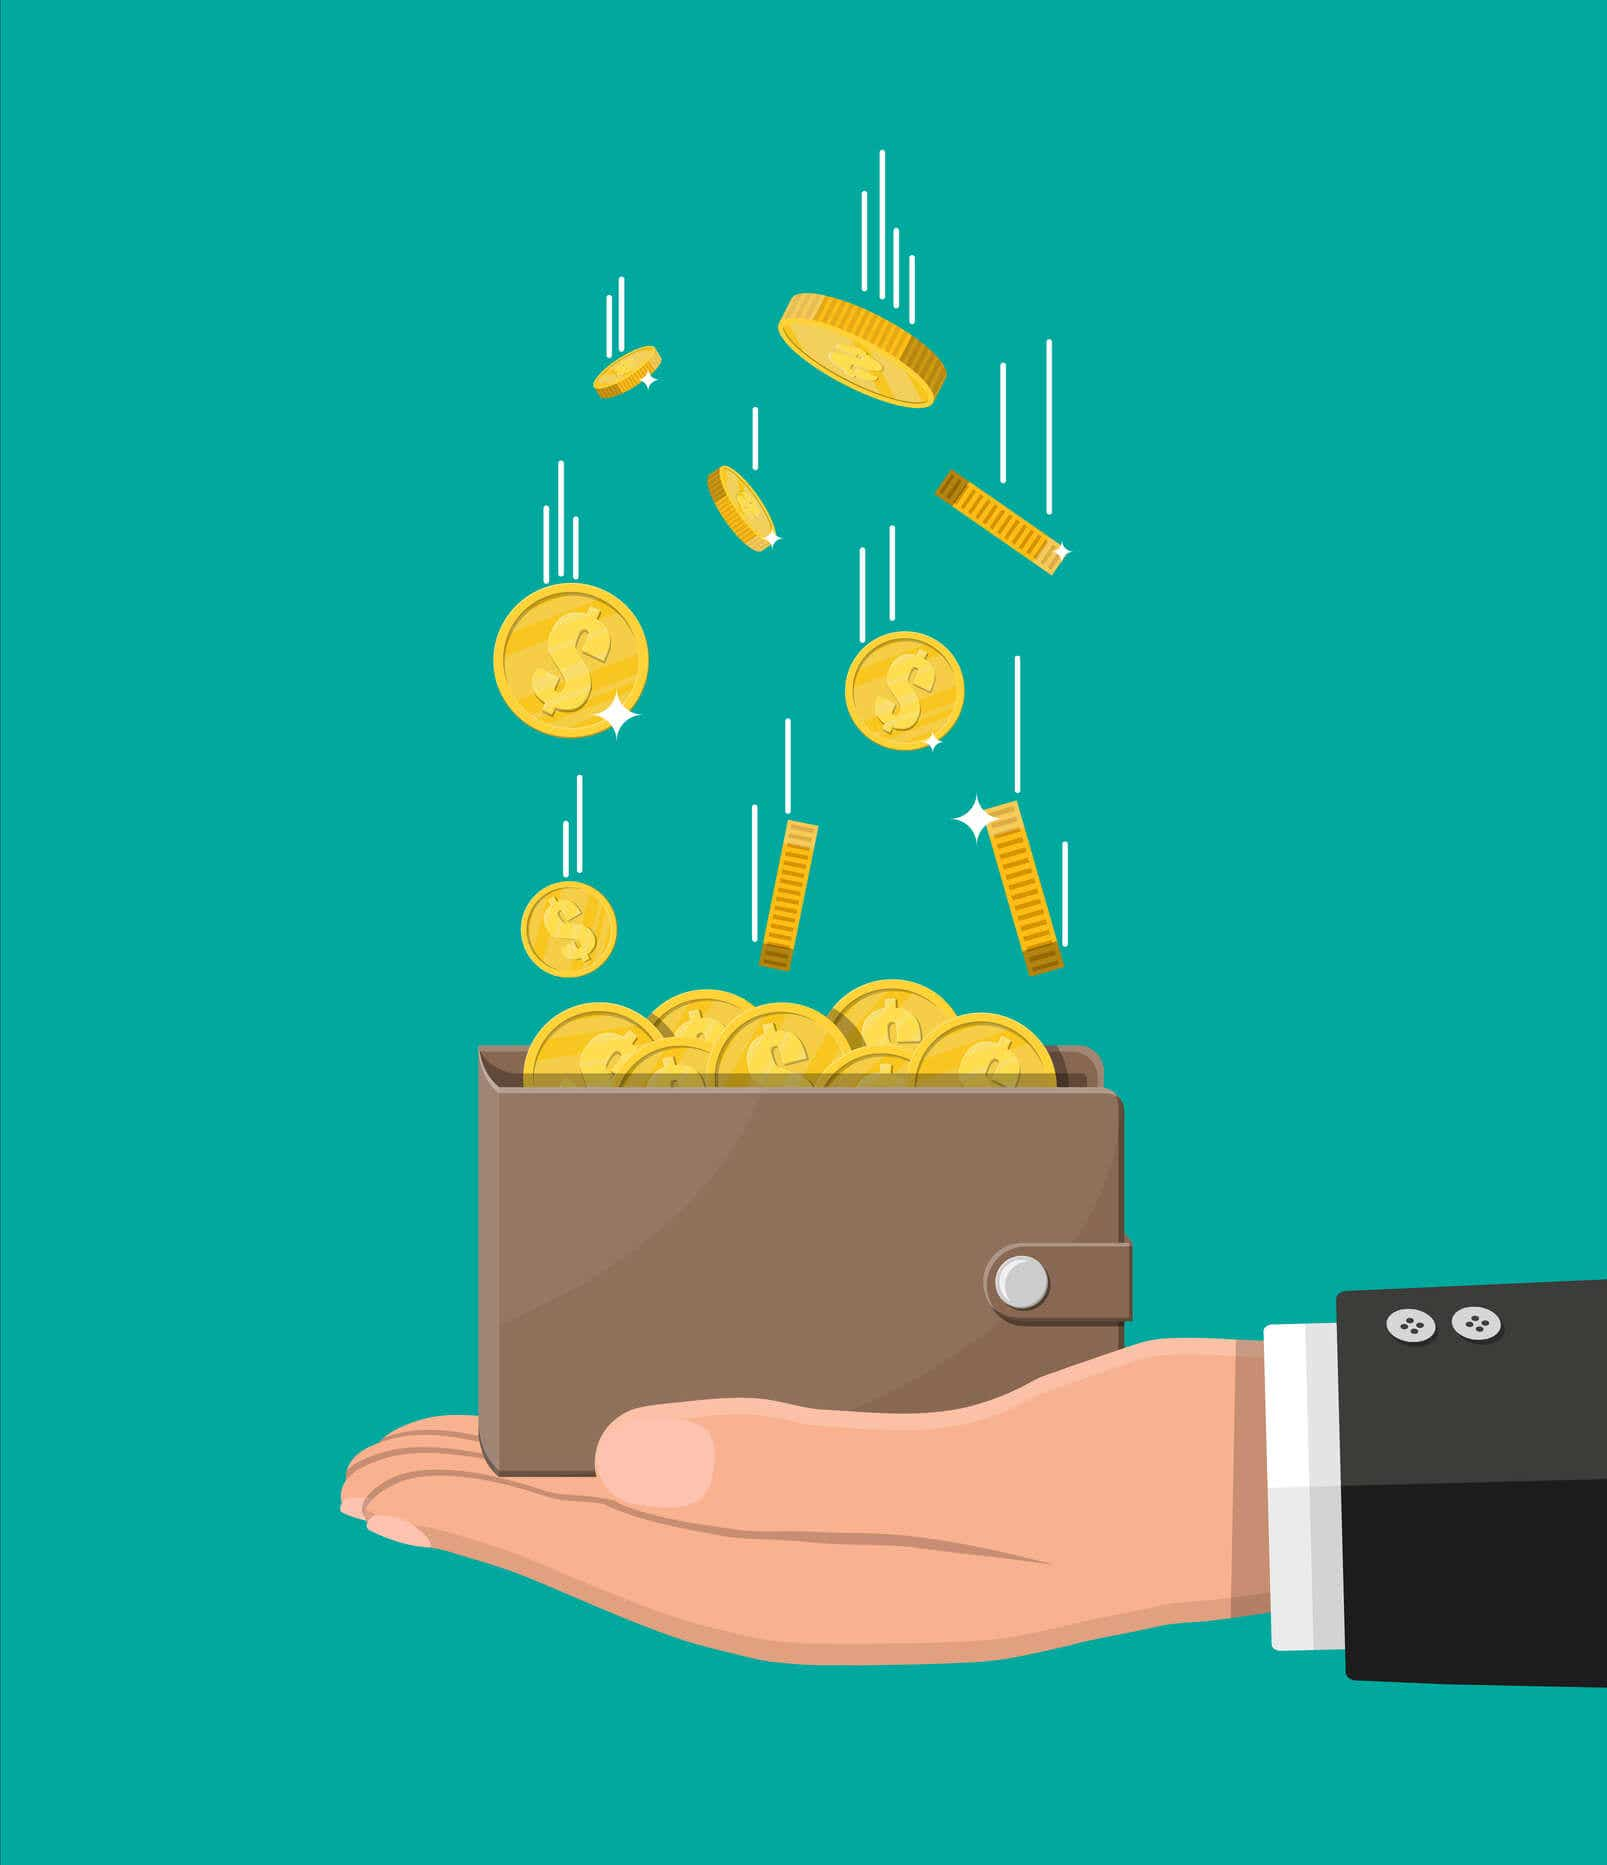 LLC advantage lean startup costs